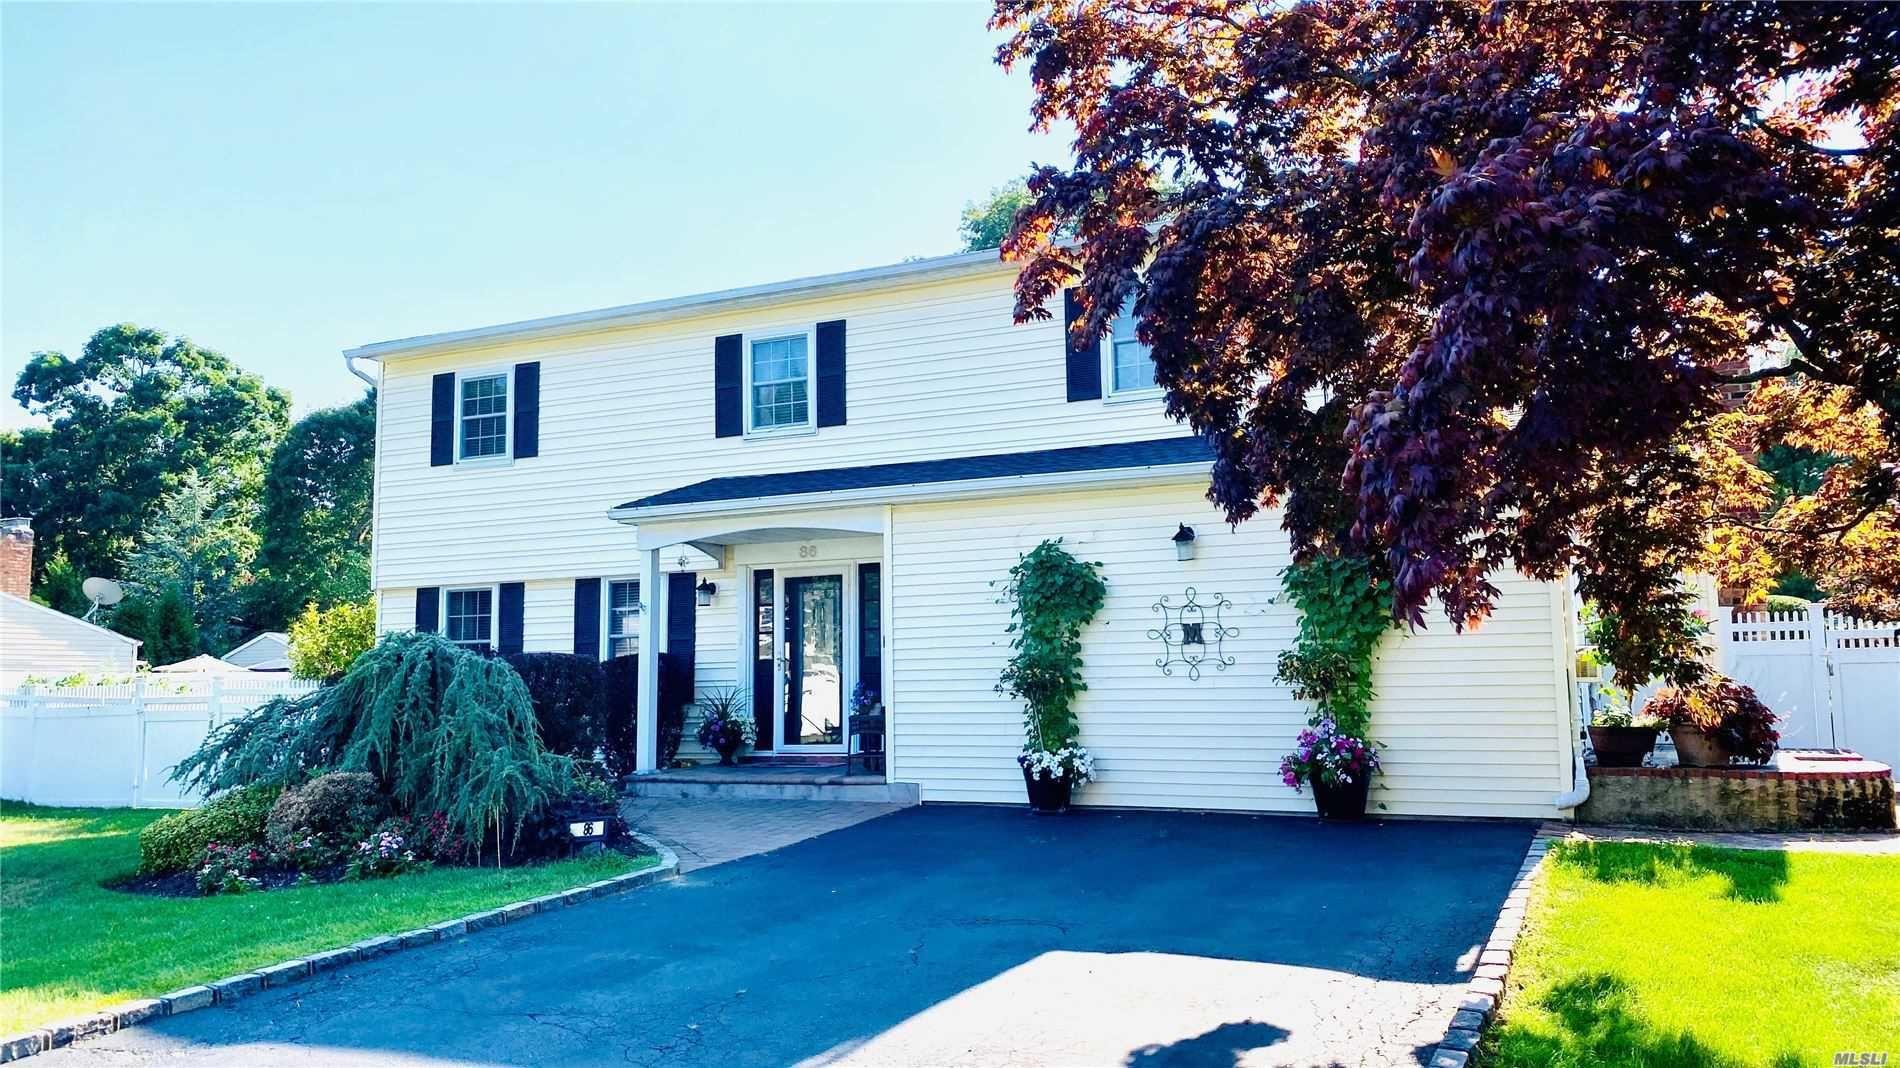 86 Woodview Ln, Centereach, NY 11720 - MLS#: 3237999